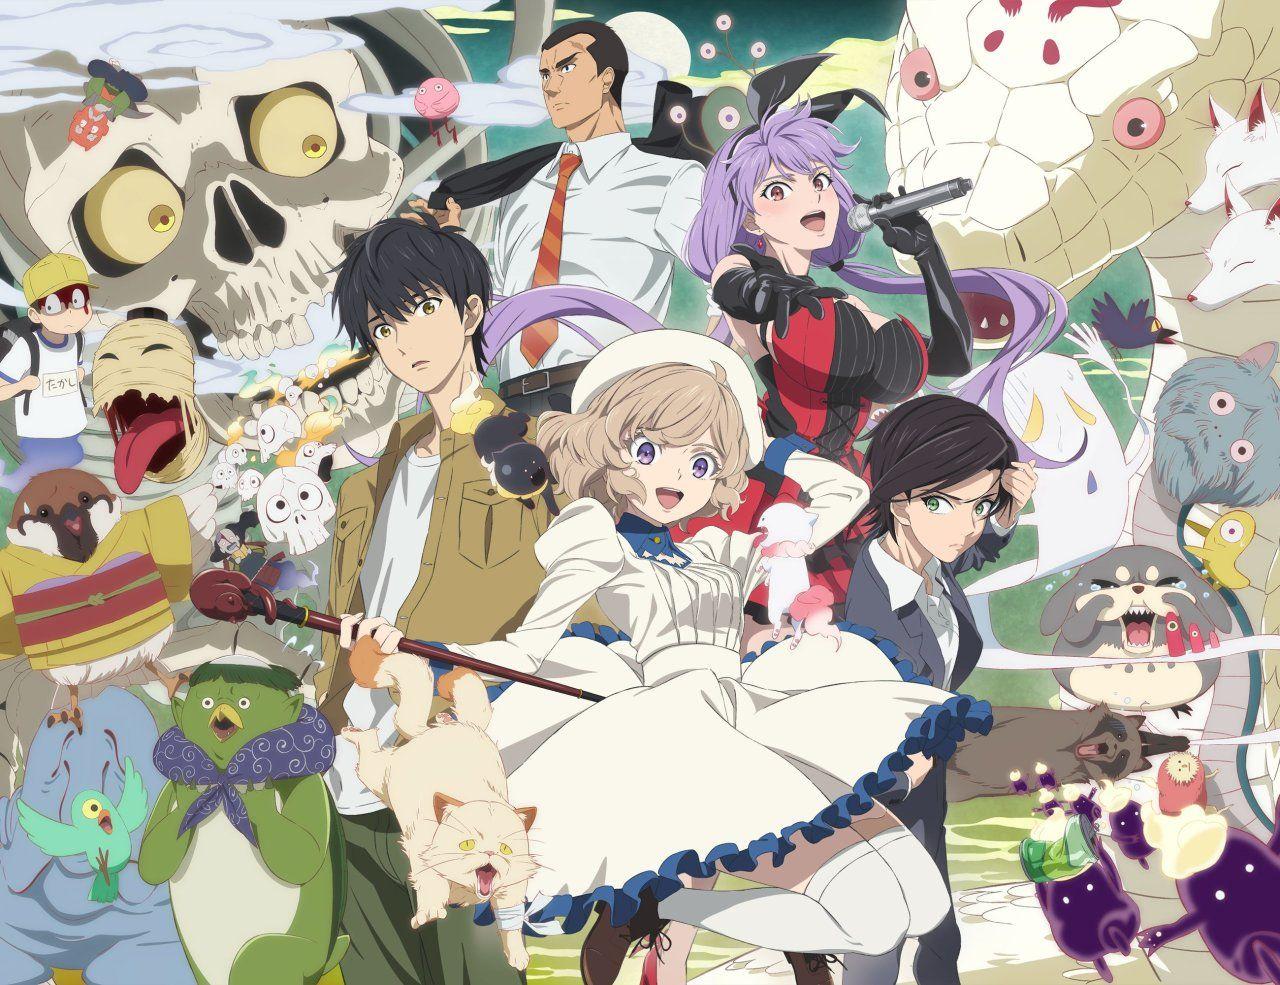 Pin de Mad freddy FMD em Videothèque em 2020 Anime